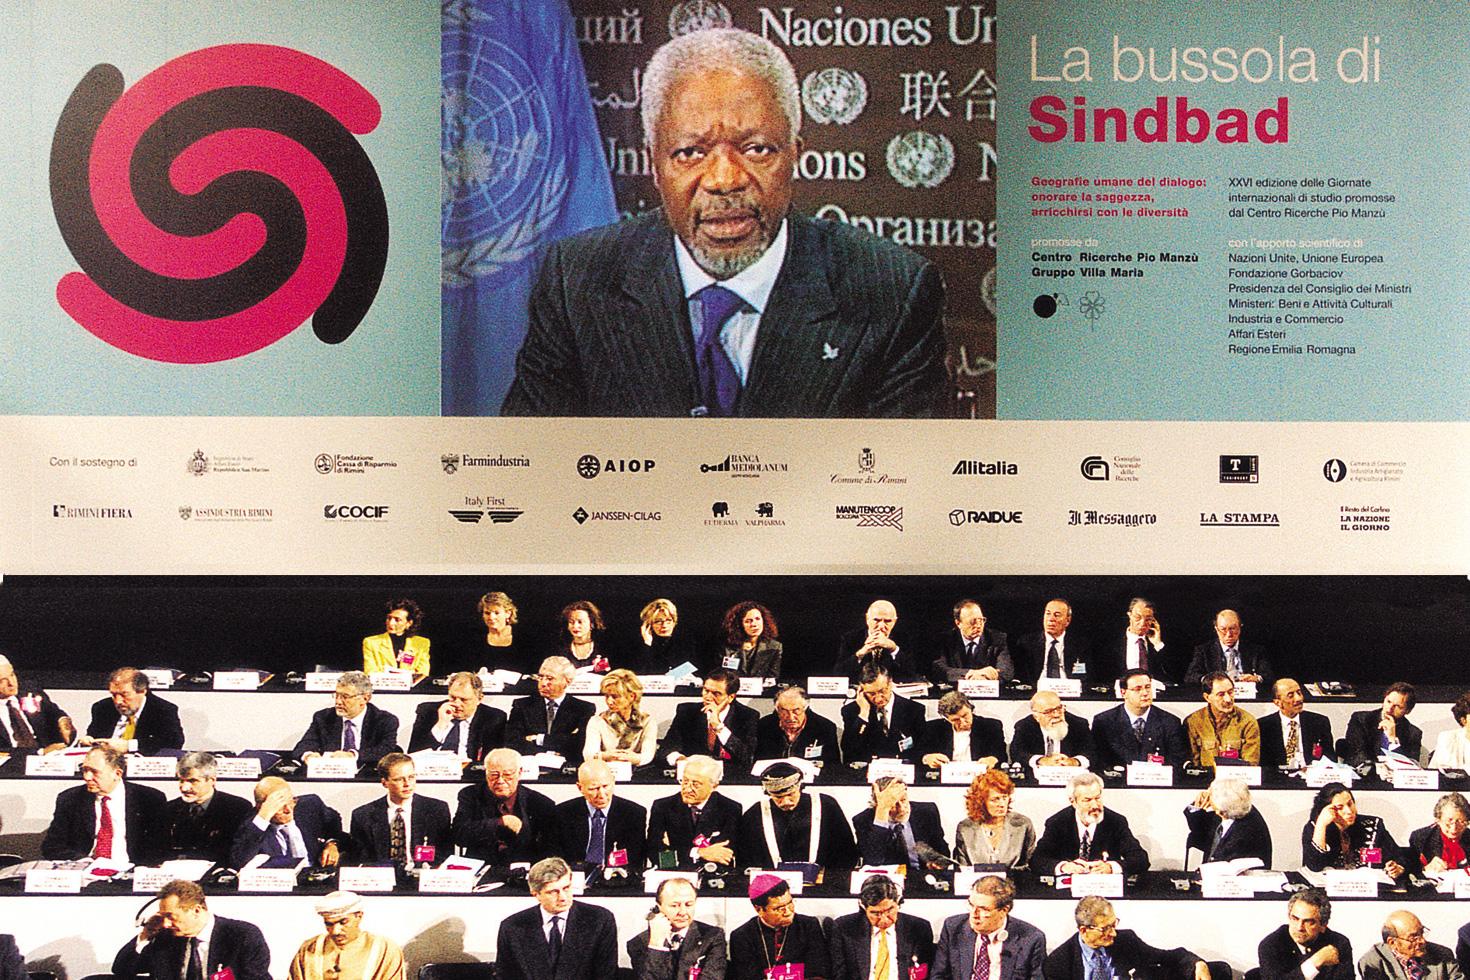 Kofi Annan speaking at conference